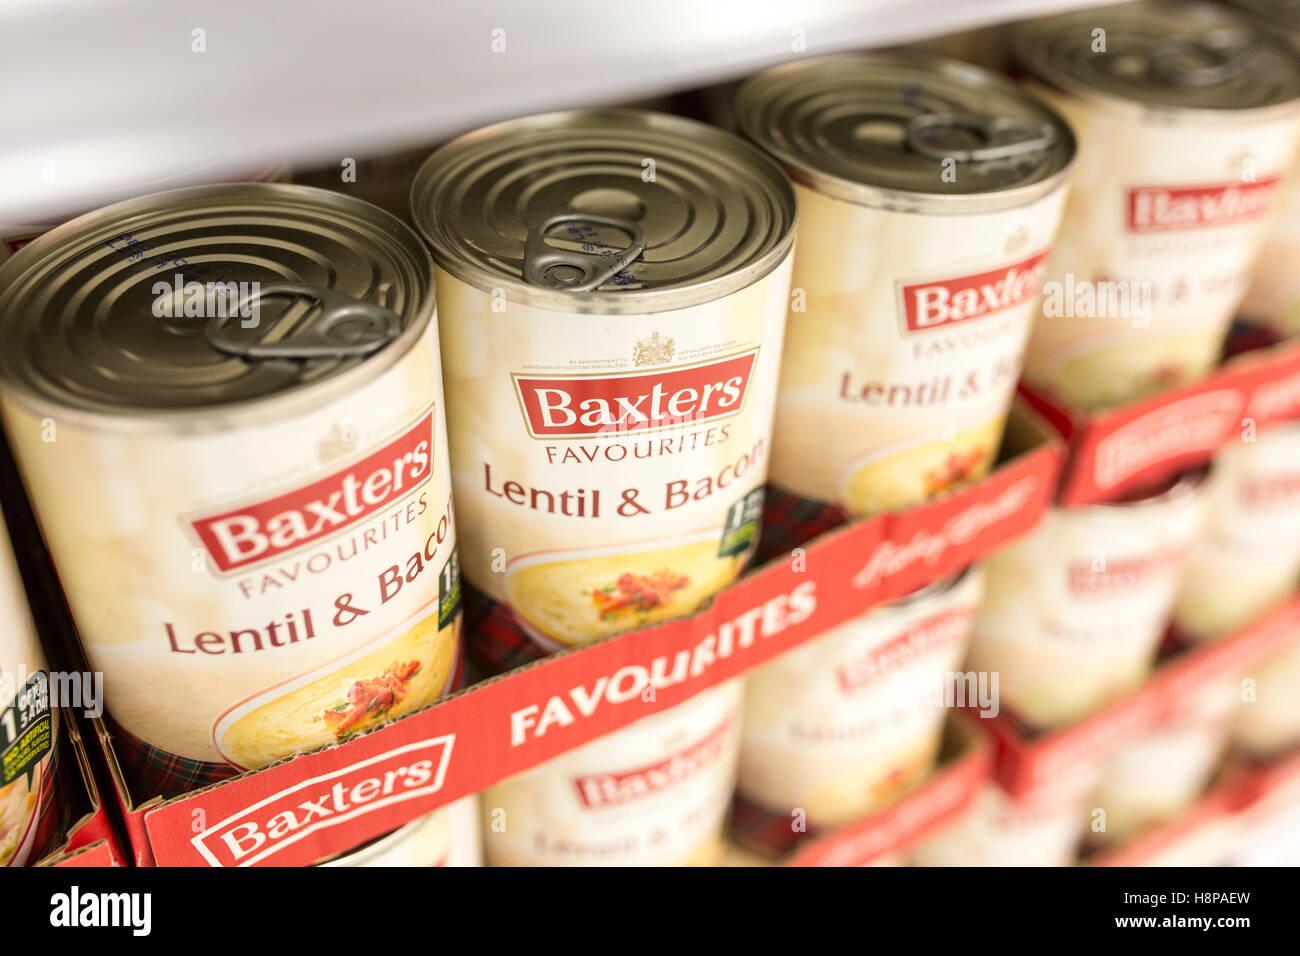 tins of Baxters soup on supermarket shelves - Stock Image